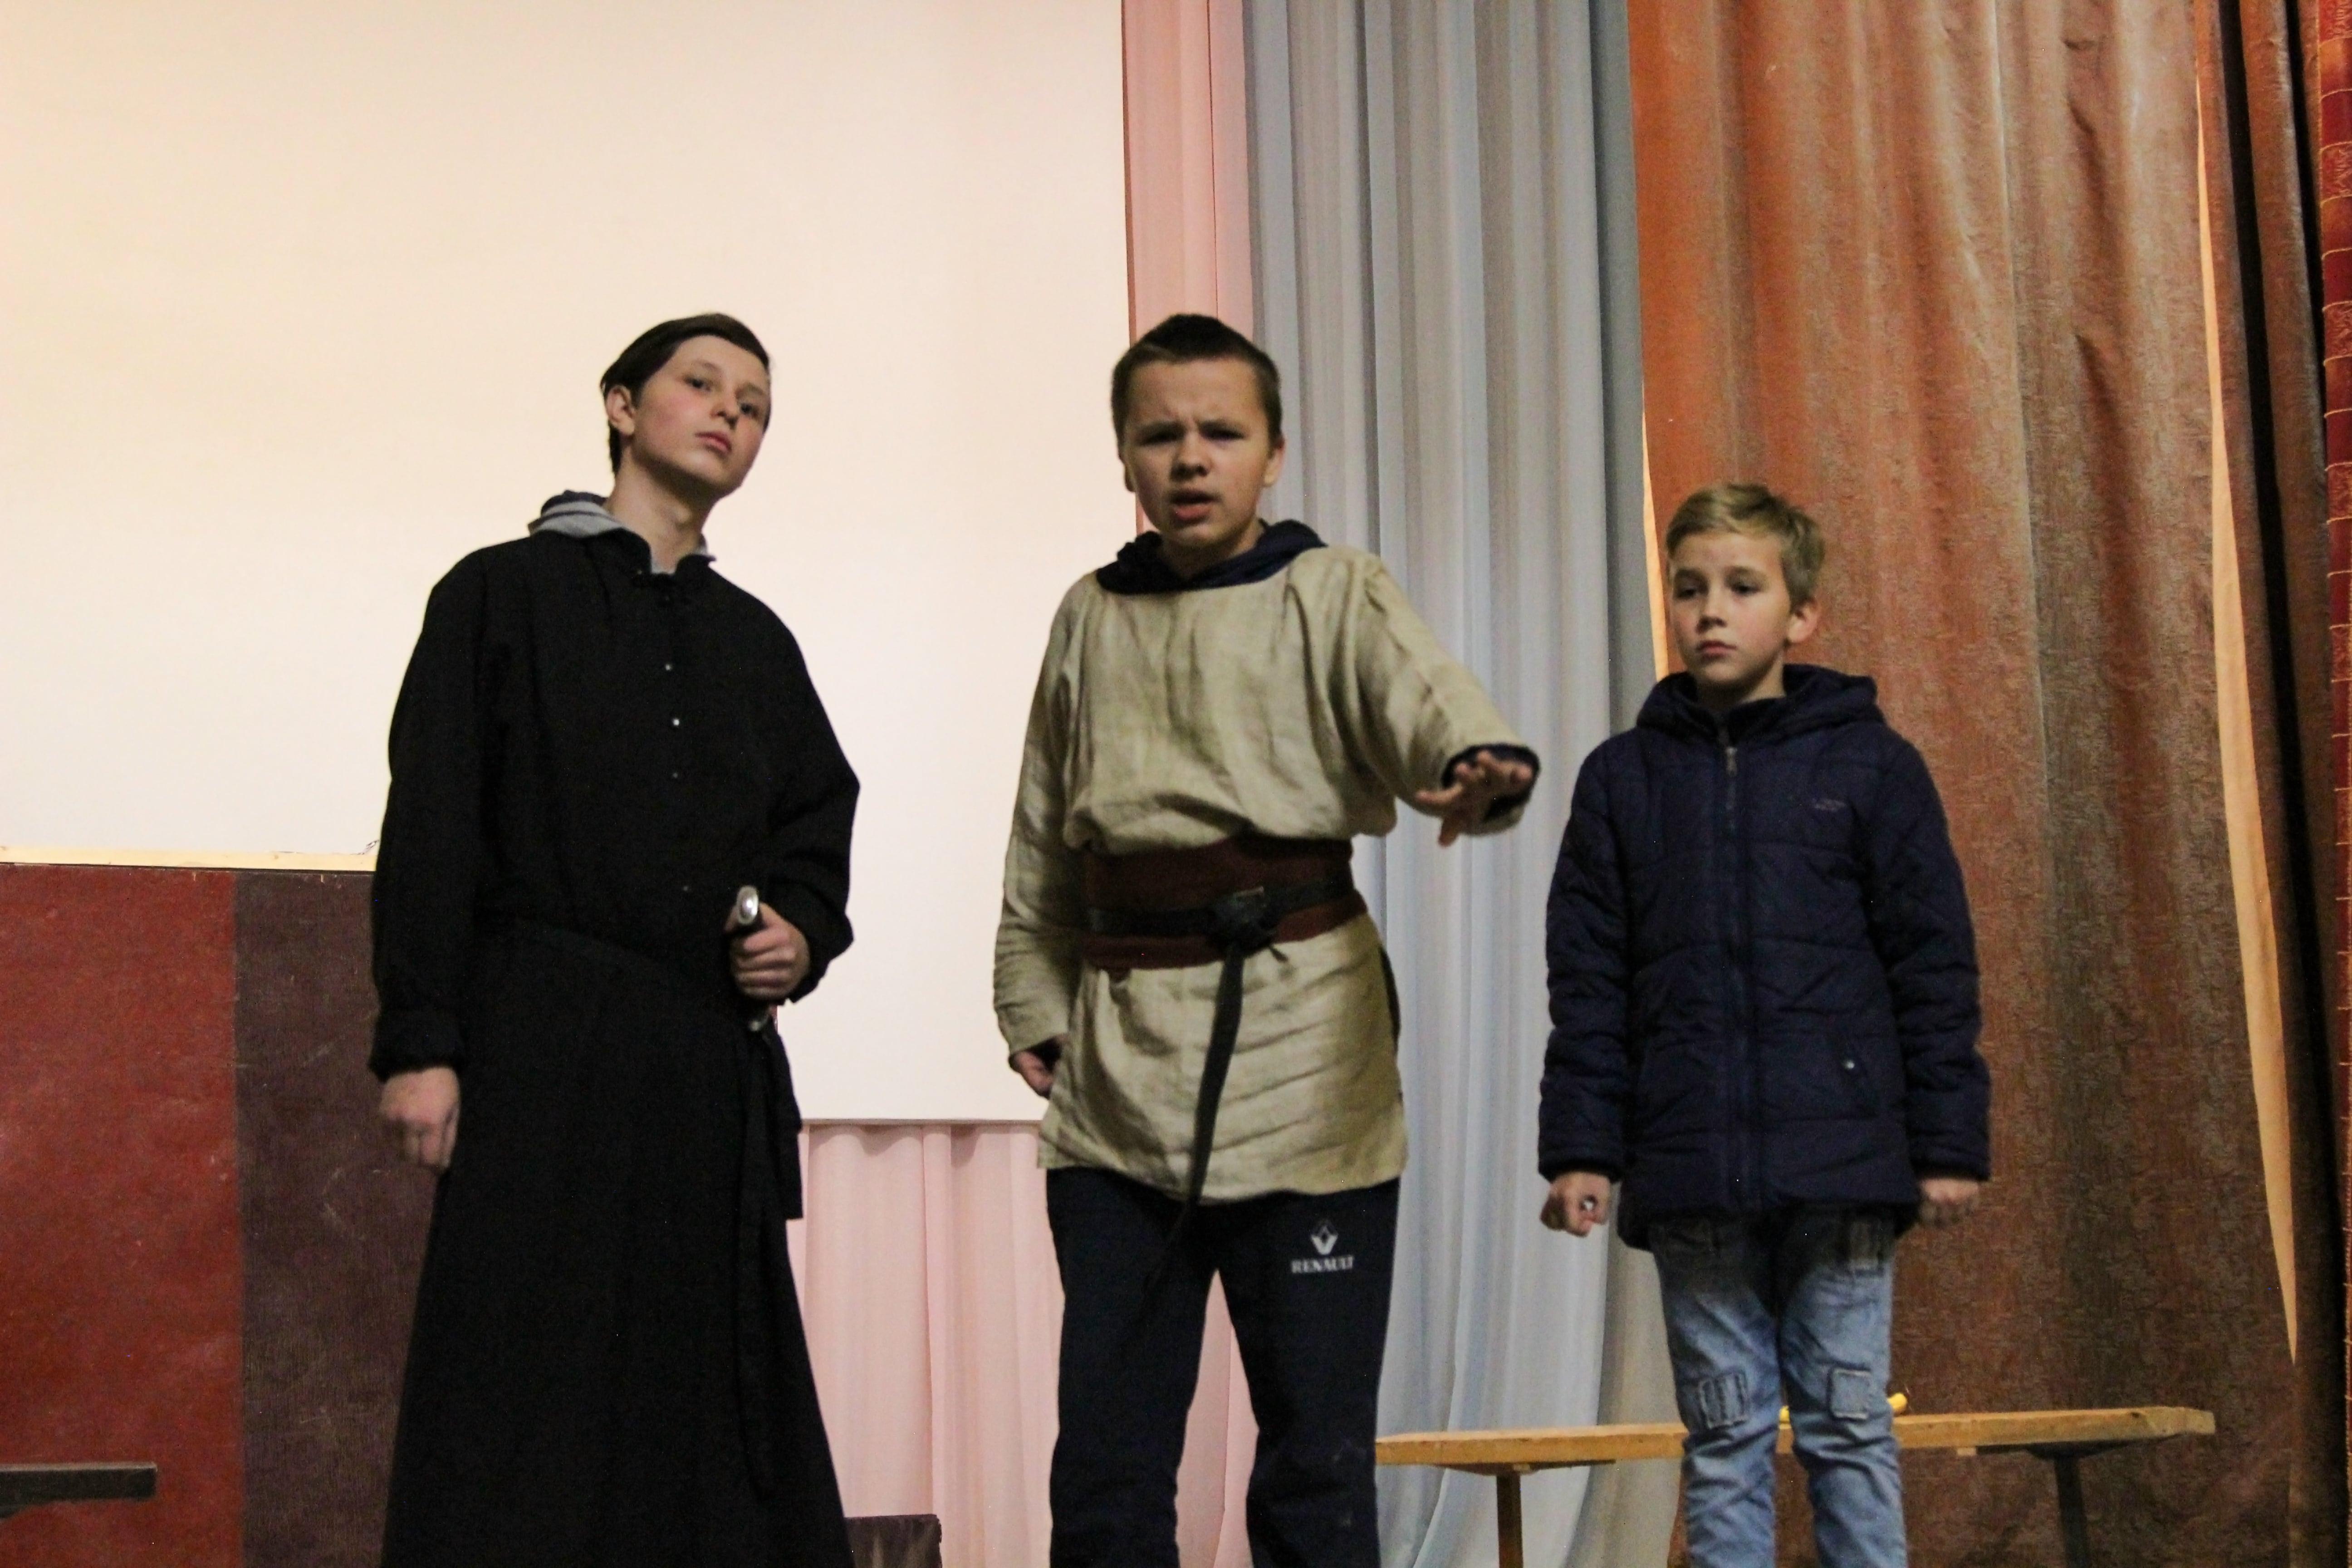 http://monuspen.ru/photoreports/97627d911b6ceee6026cc1d83fc8321r.JPG